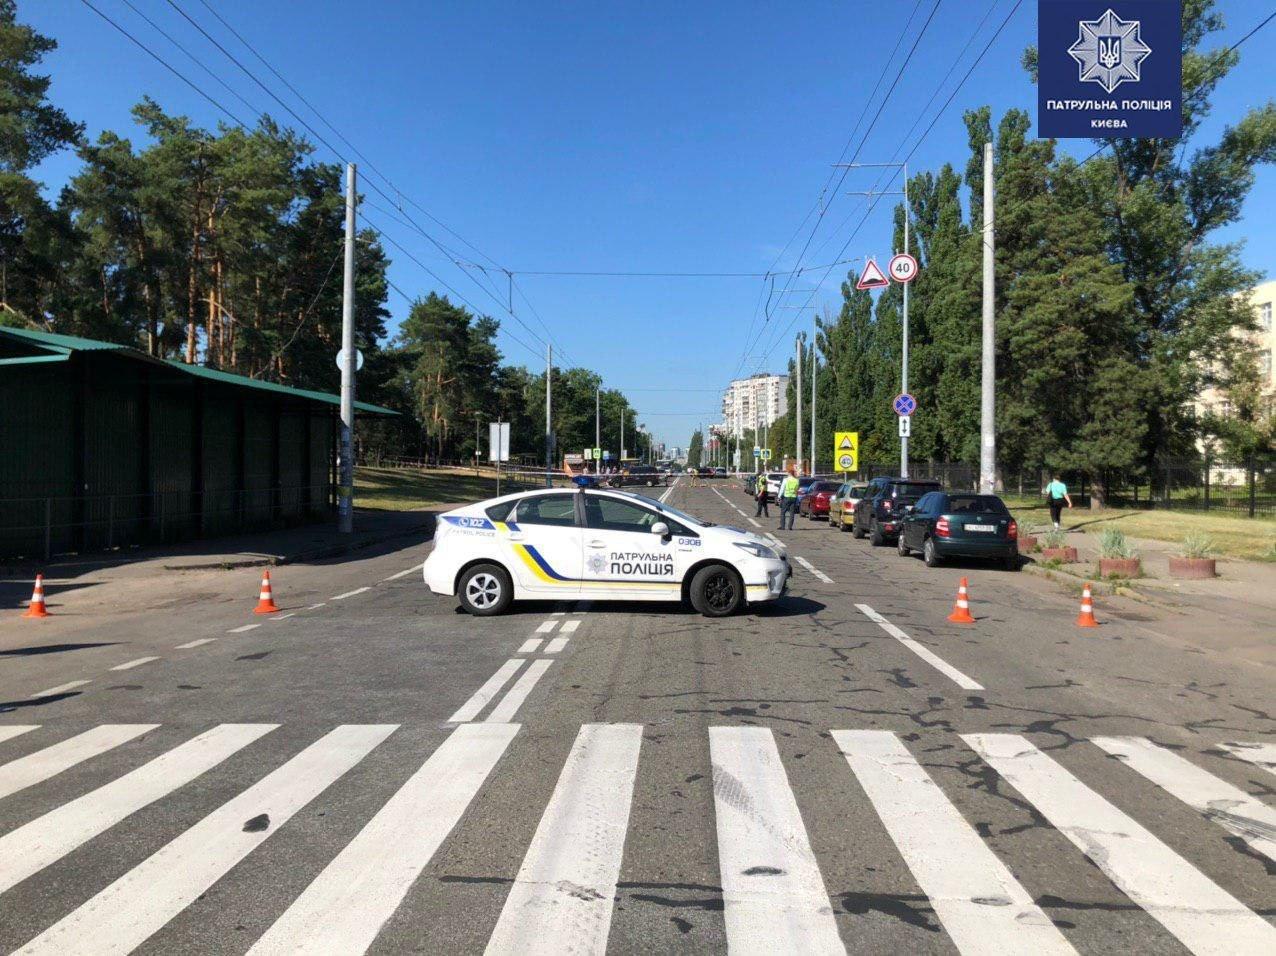 В Киеве перекрыли дорогу недалеко от станции метро: детали , фото-2